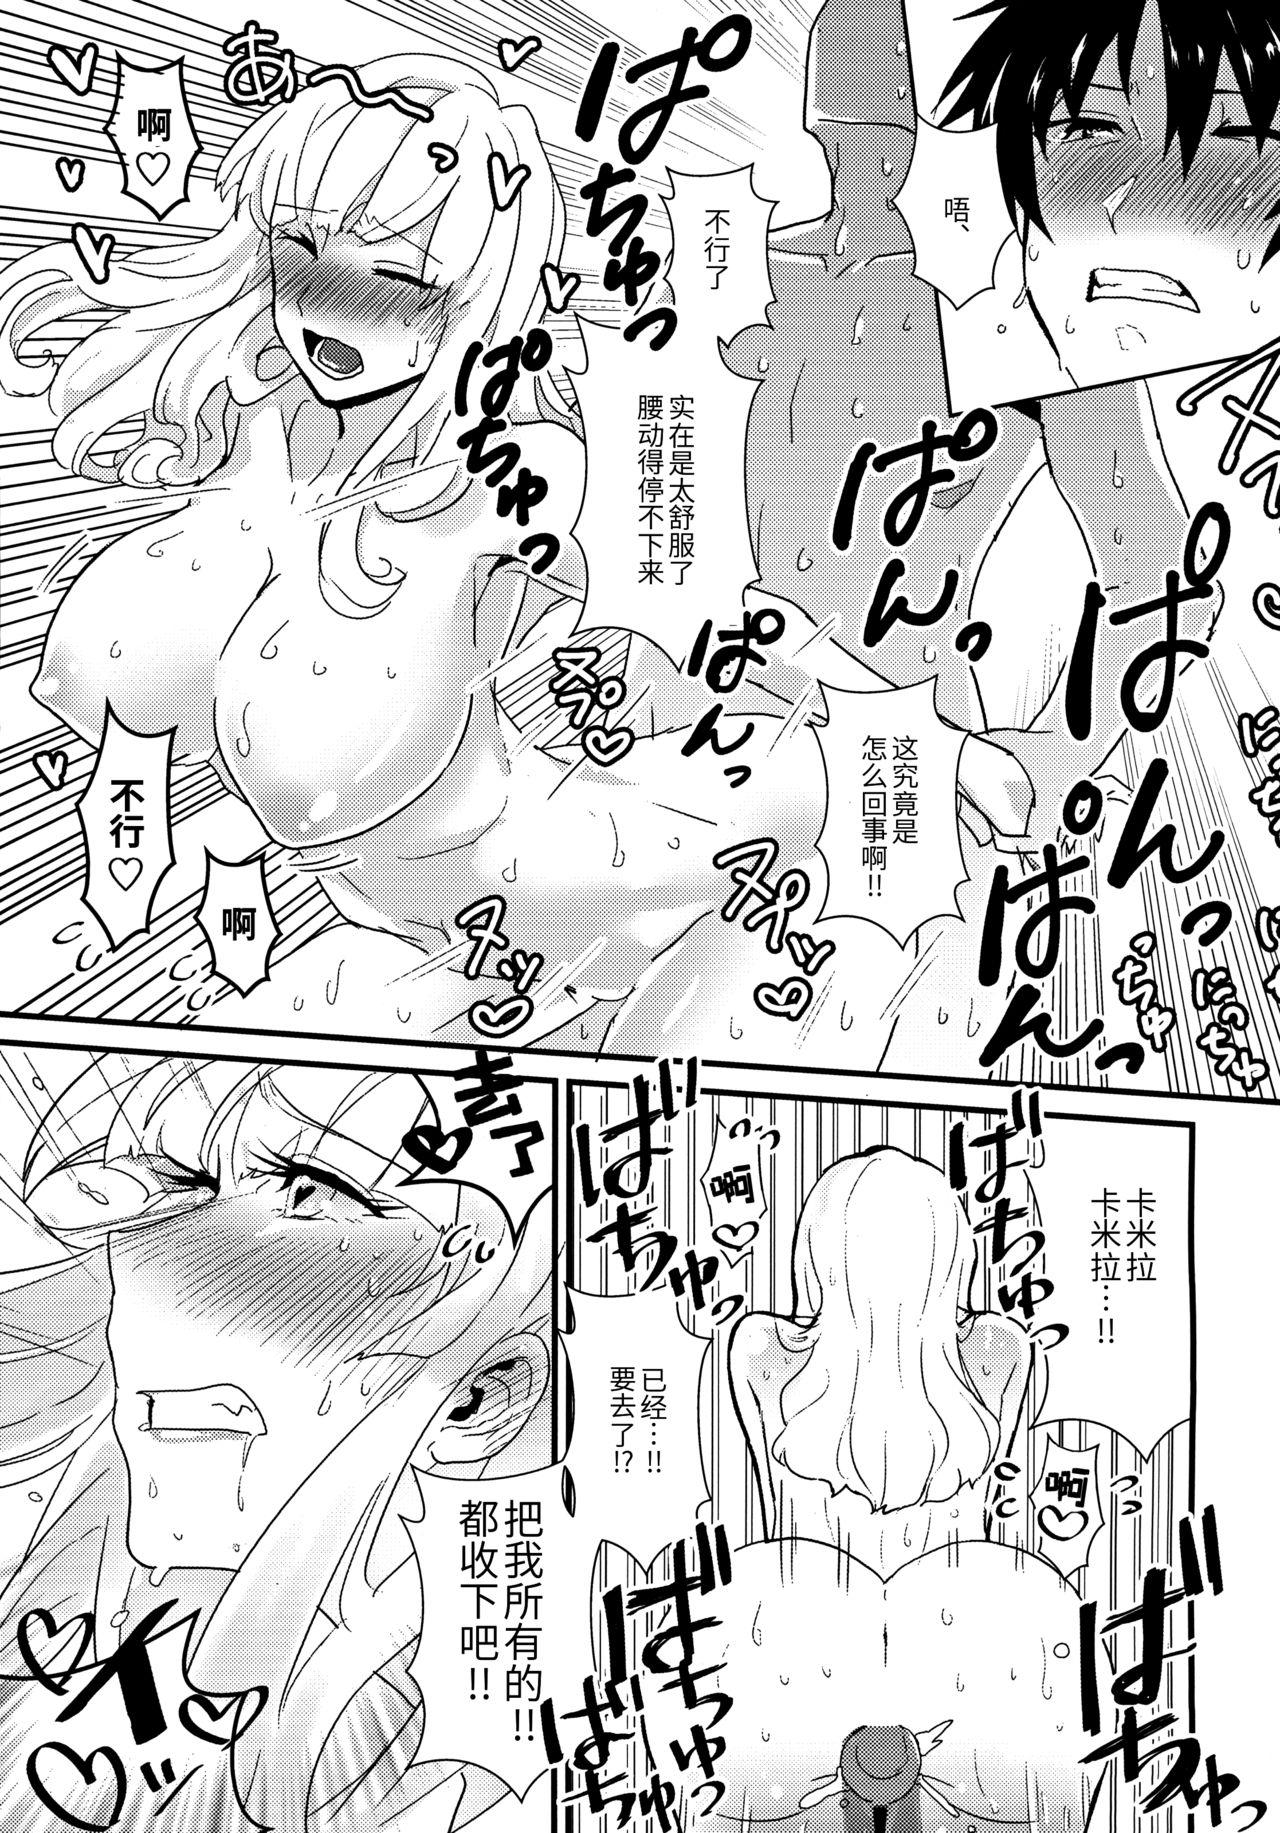 Carmilla-san to Ichaicha Shitai! 16